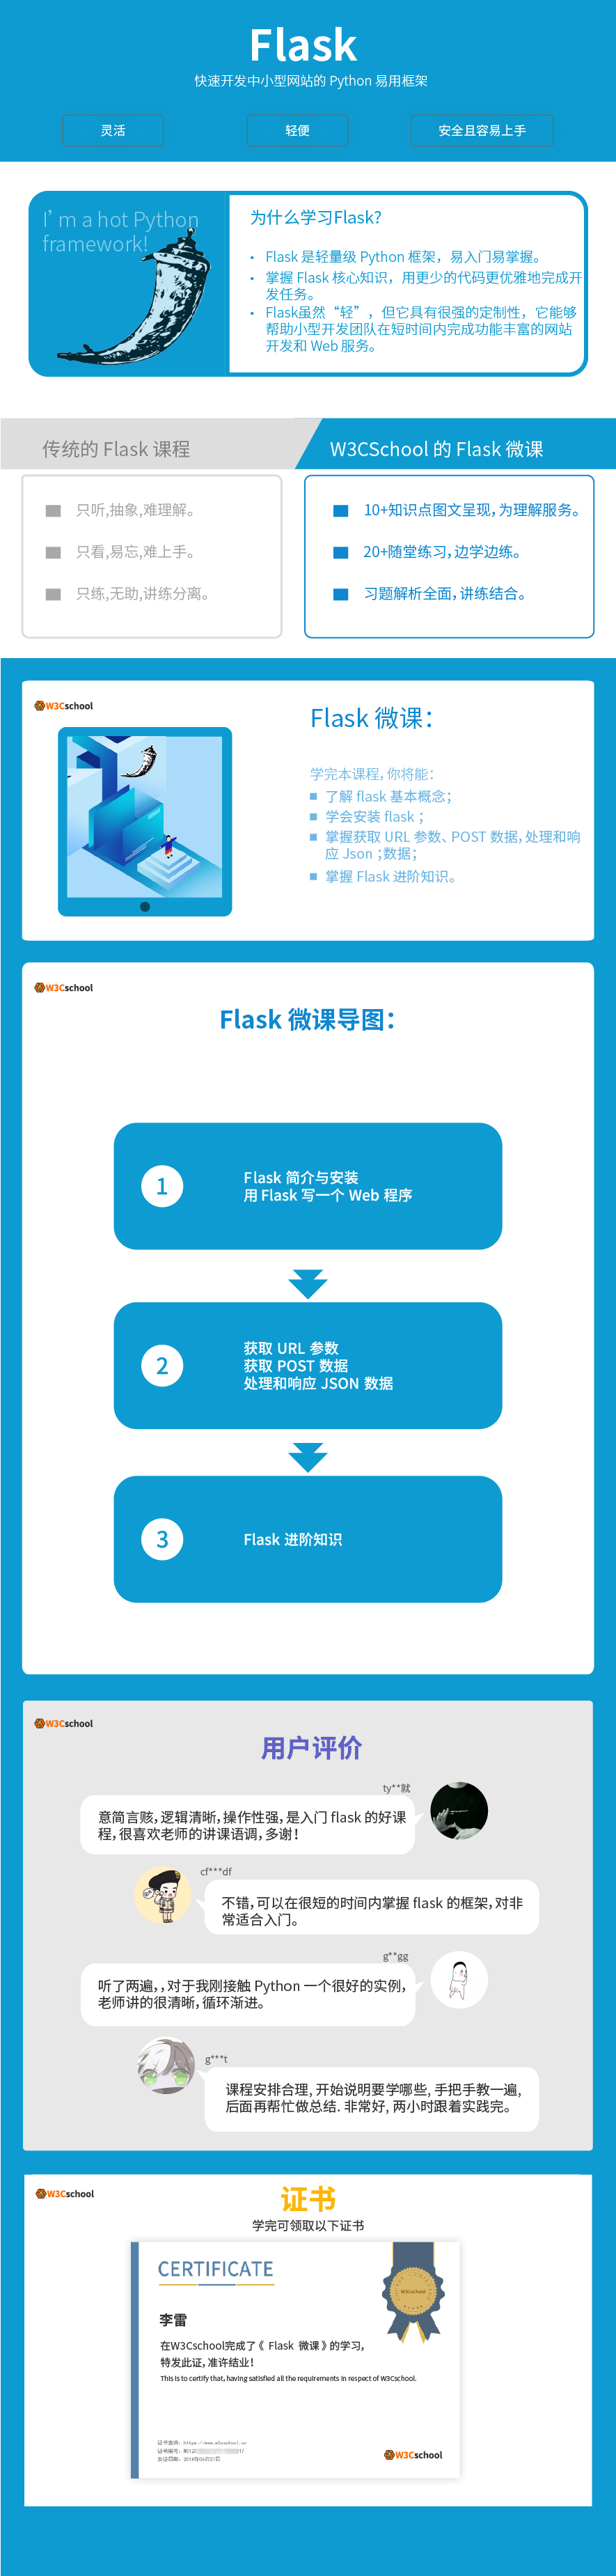 微課詳情頁_Flask